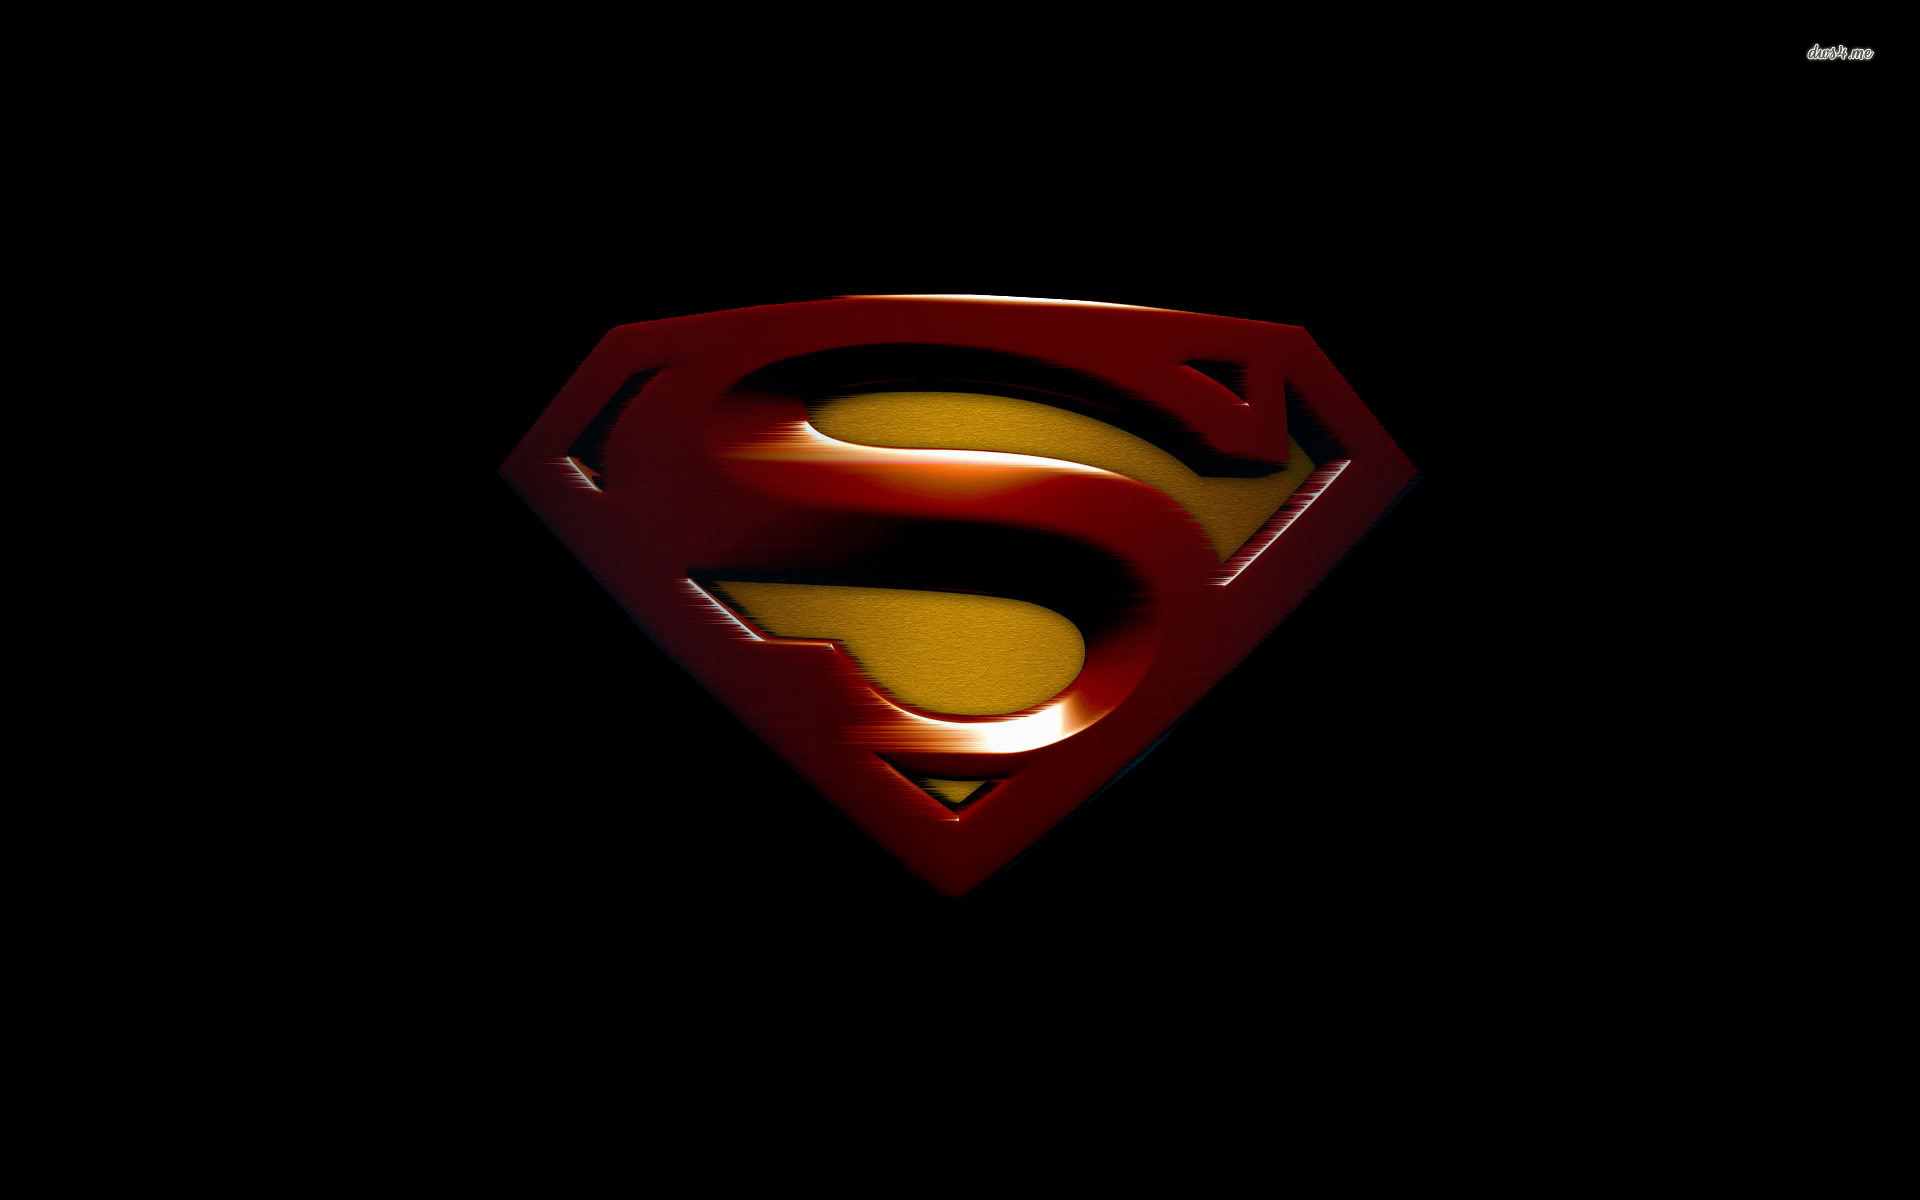 superman logo superman logo tweet related post superman logo wallpaper 1920x1200